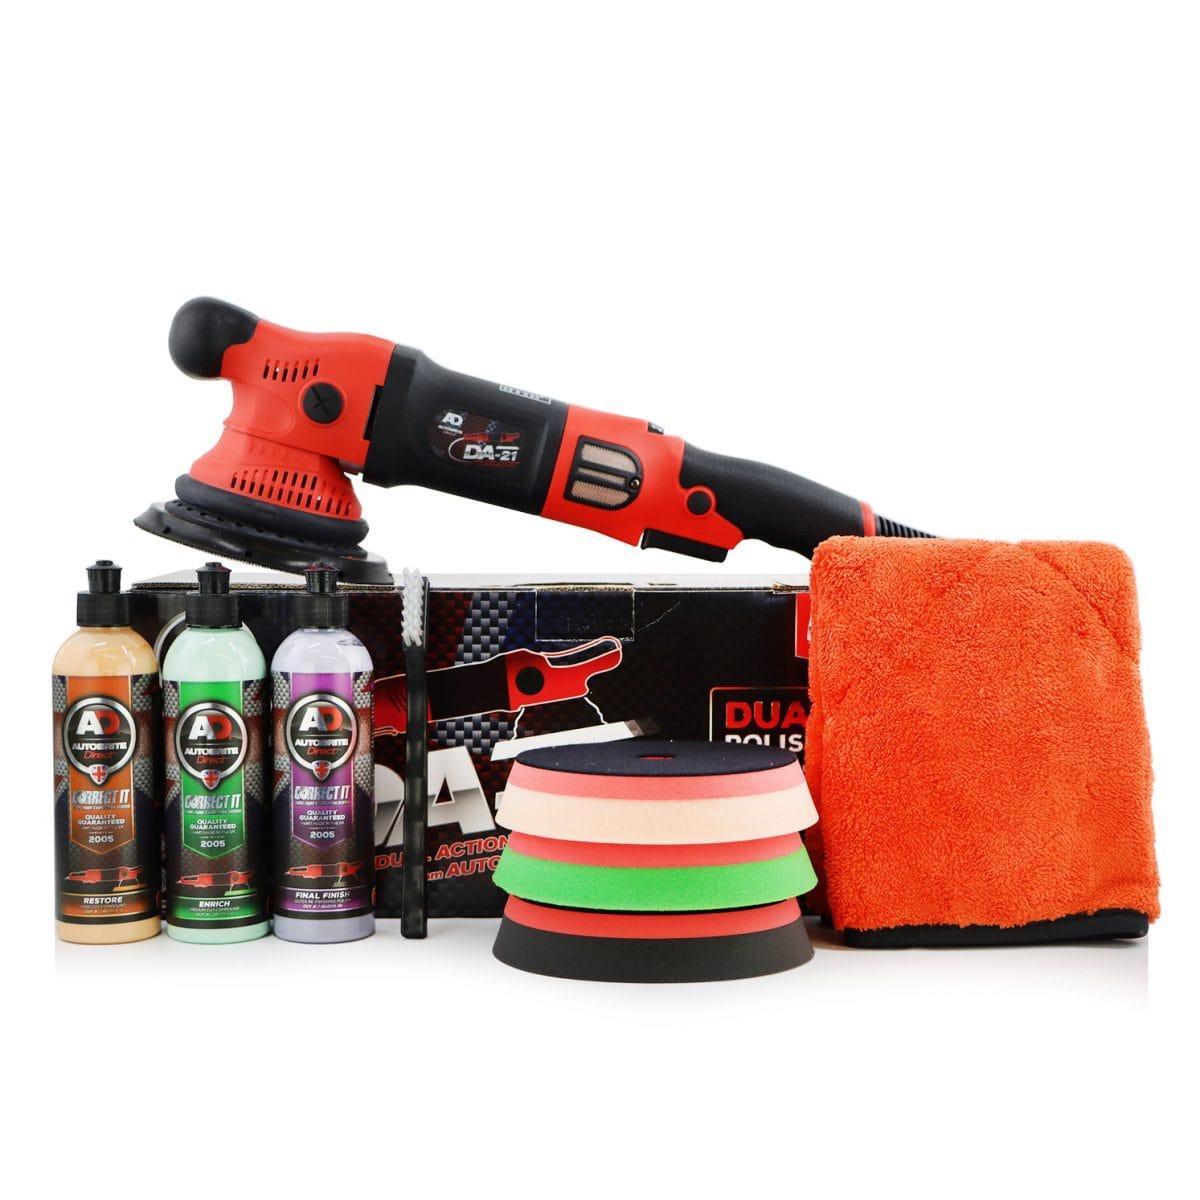 car polishing kit with 3 types of car polish